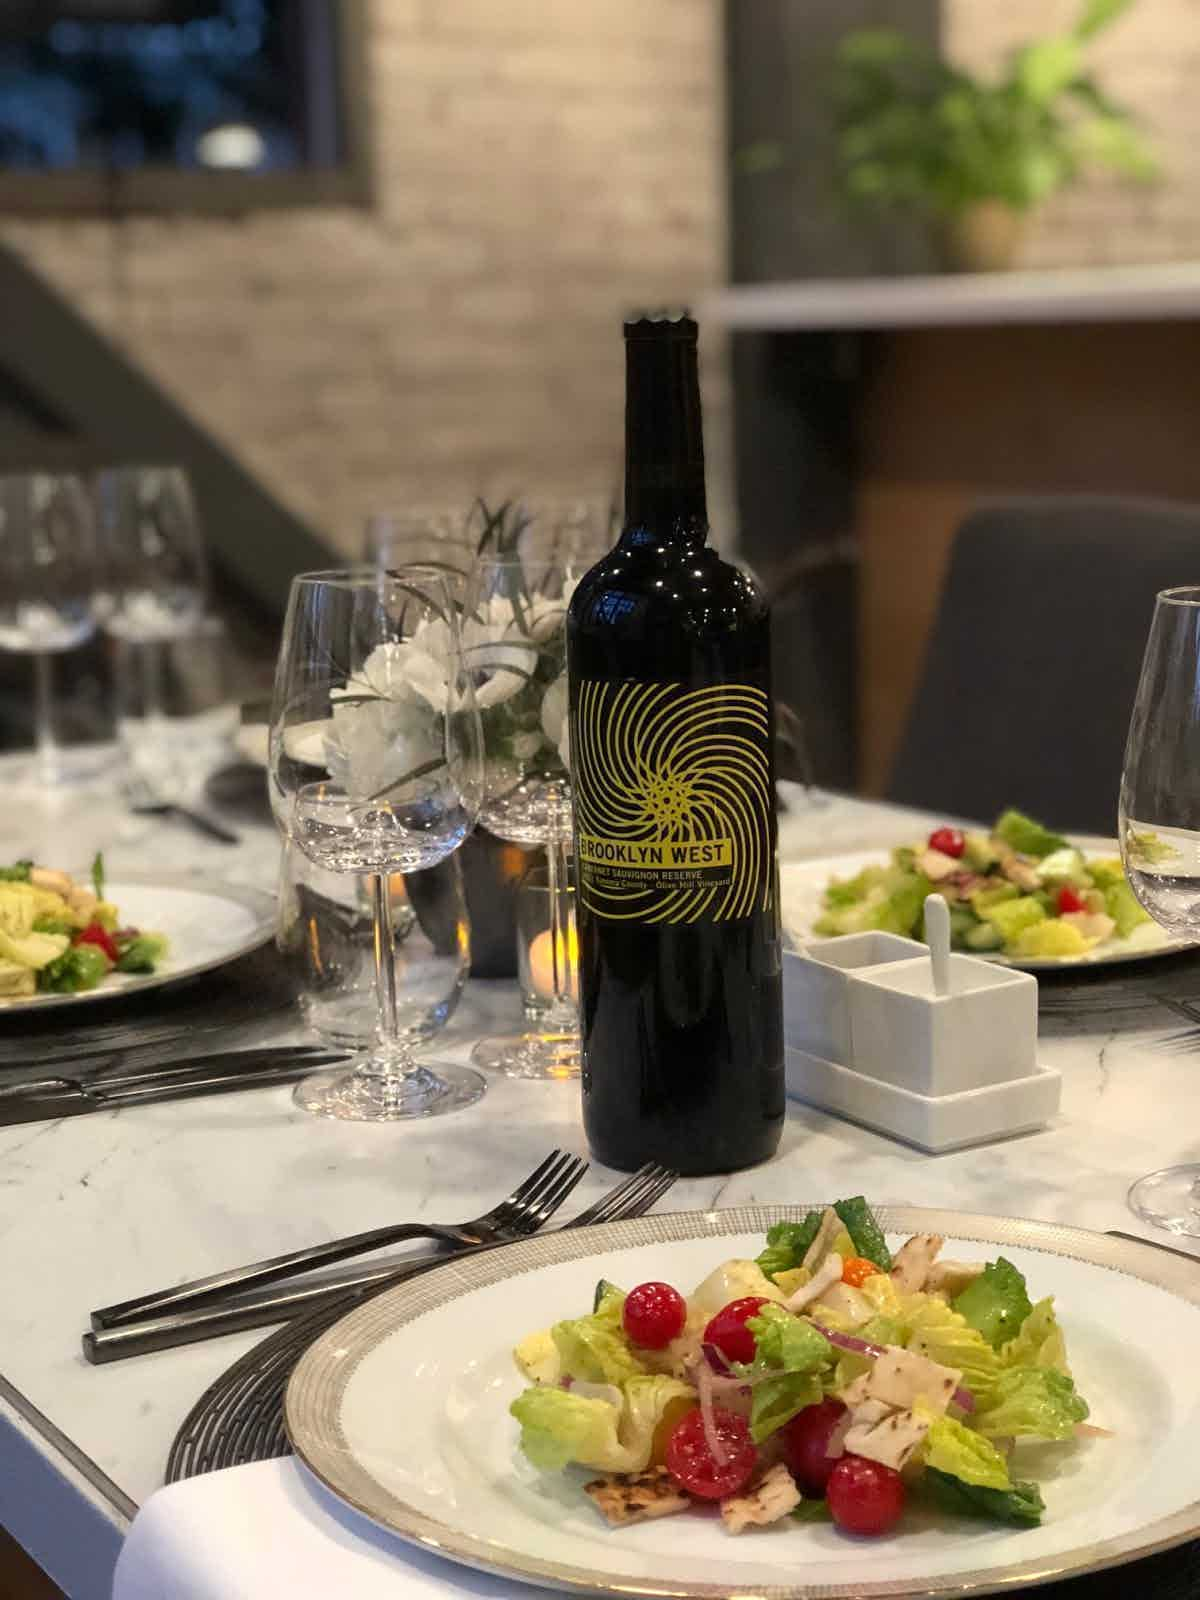 Brooklyn West Winery - Oakland | Restaurant Review - Zagat